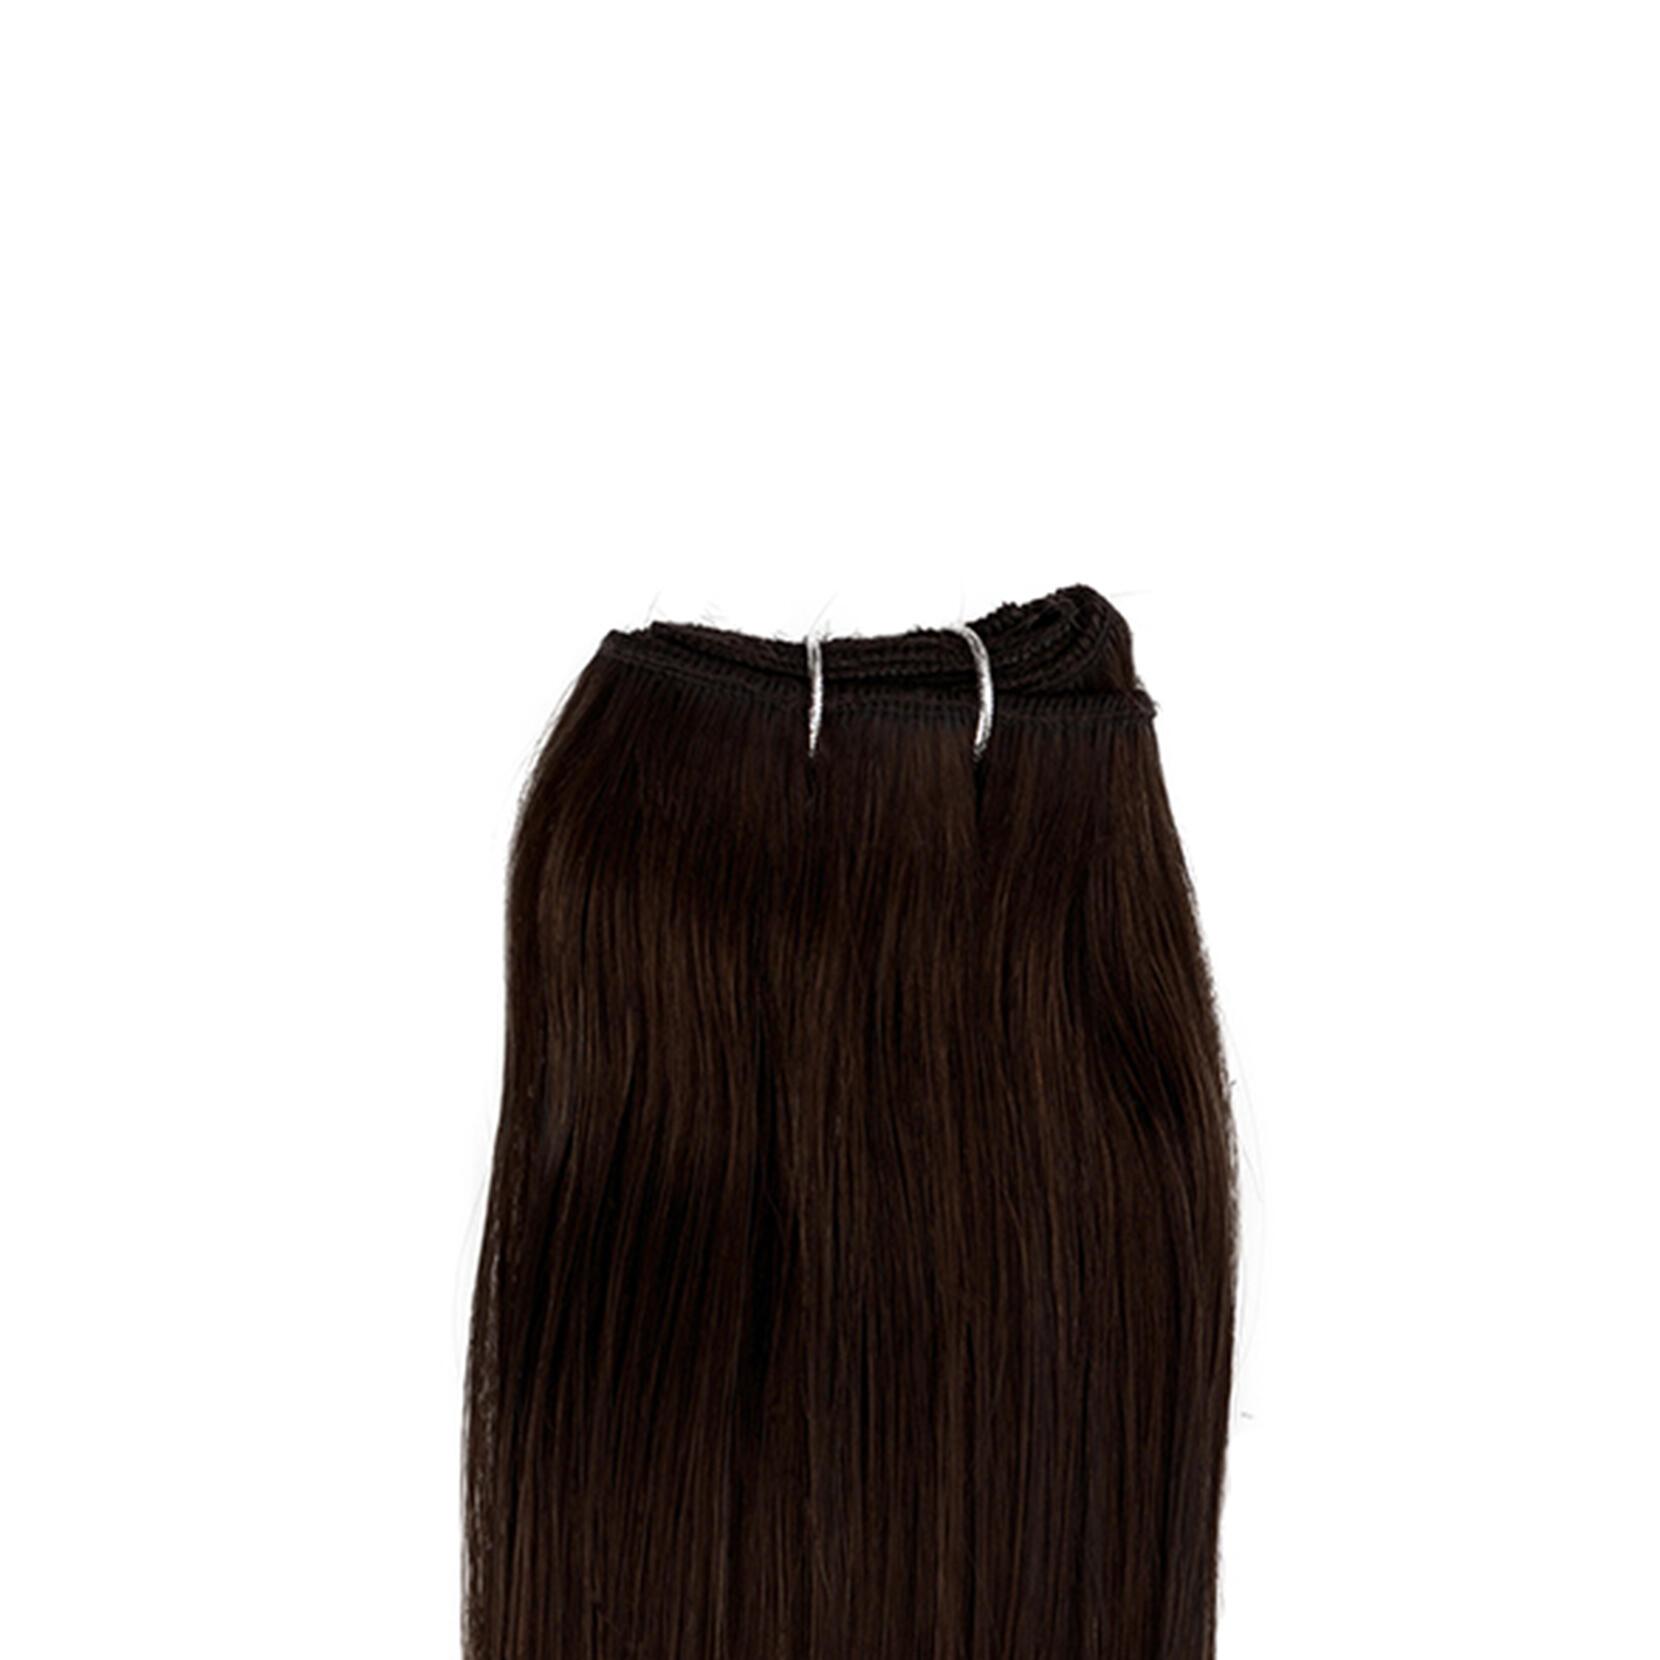 Hair Weft Original Straight 2.2 Coffee Brown 50 cm